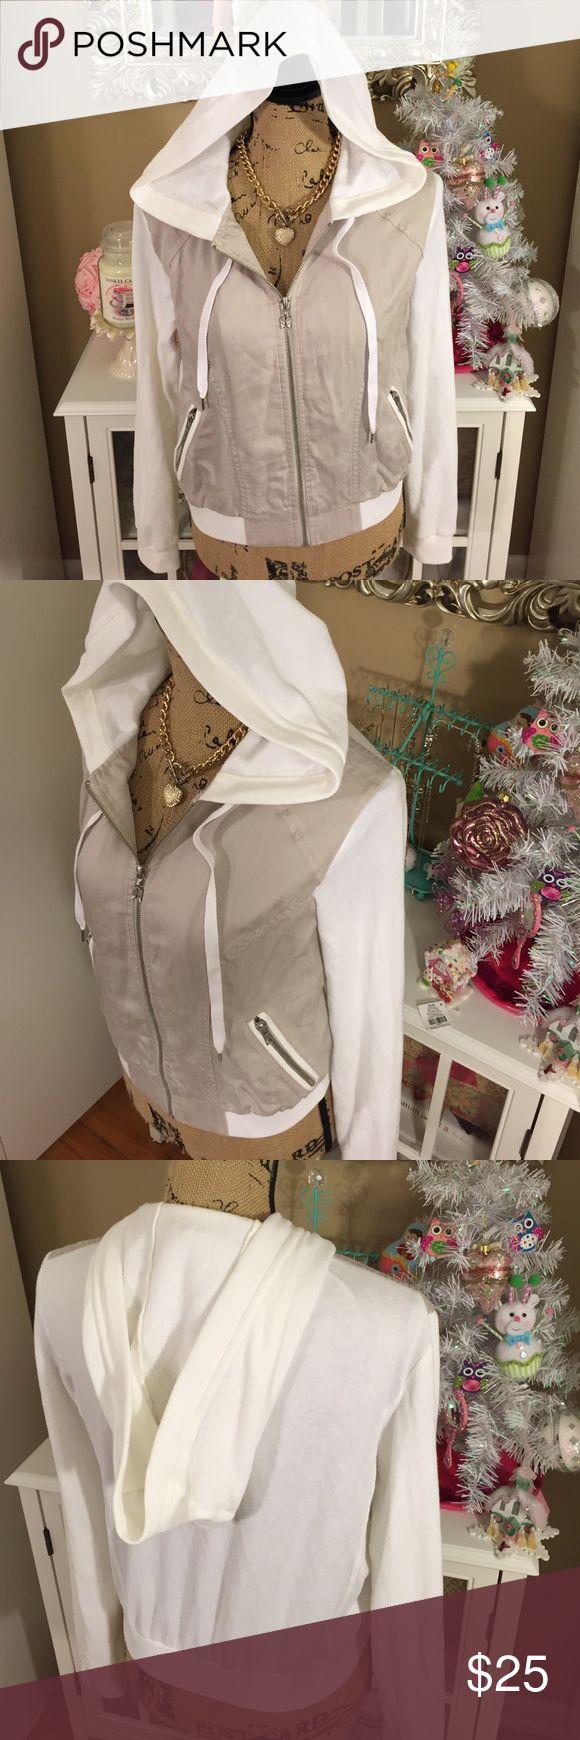 Victoria's Secret Snow Bunny White & Beige Jacket Adorable, rare Victoria's Secret white & beige zip up jacket with pockets & hood. Like new! ❄️ Victoria's Secret Jackets & Coats